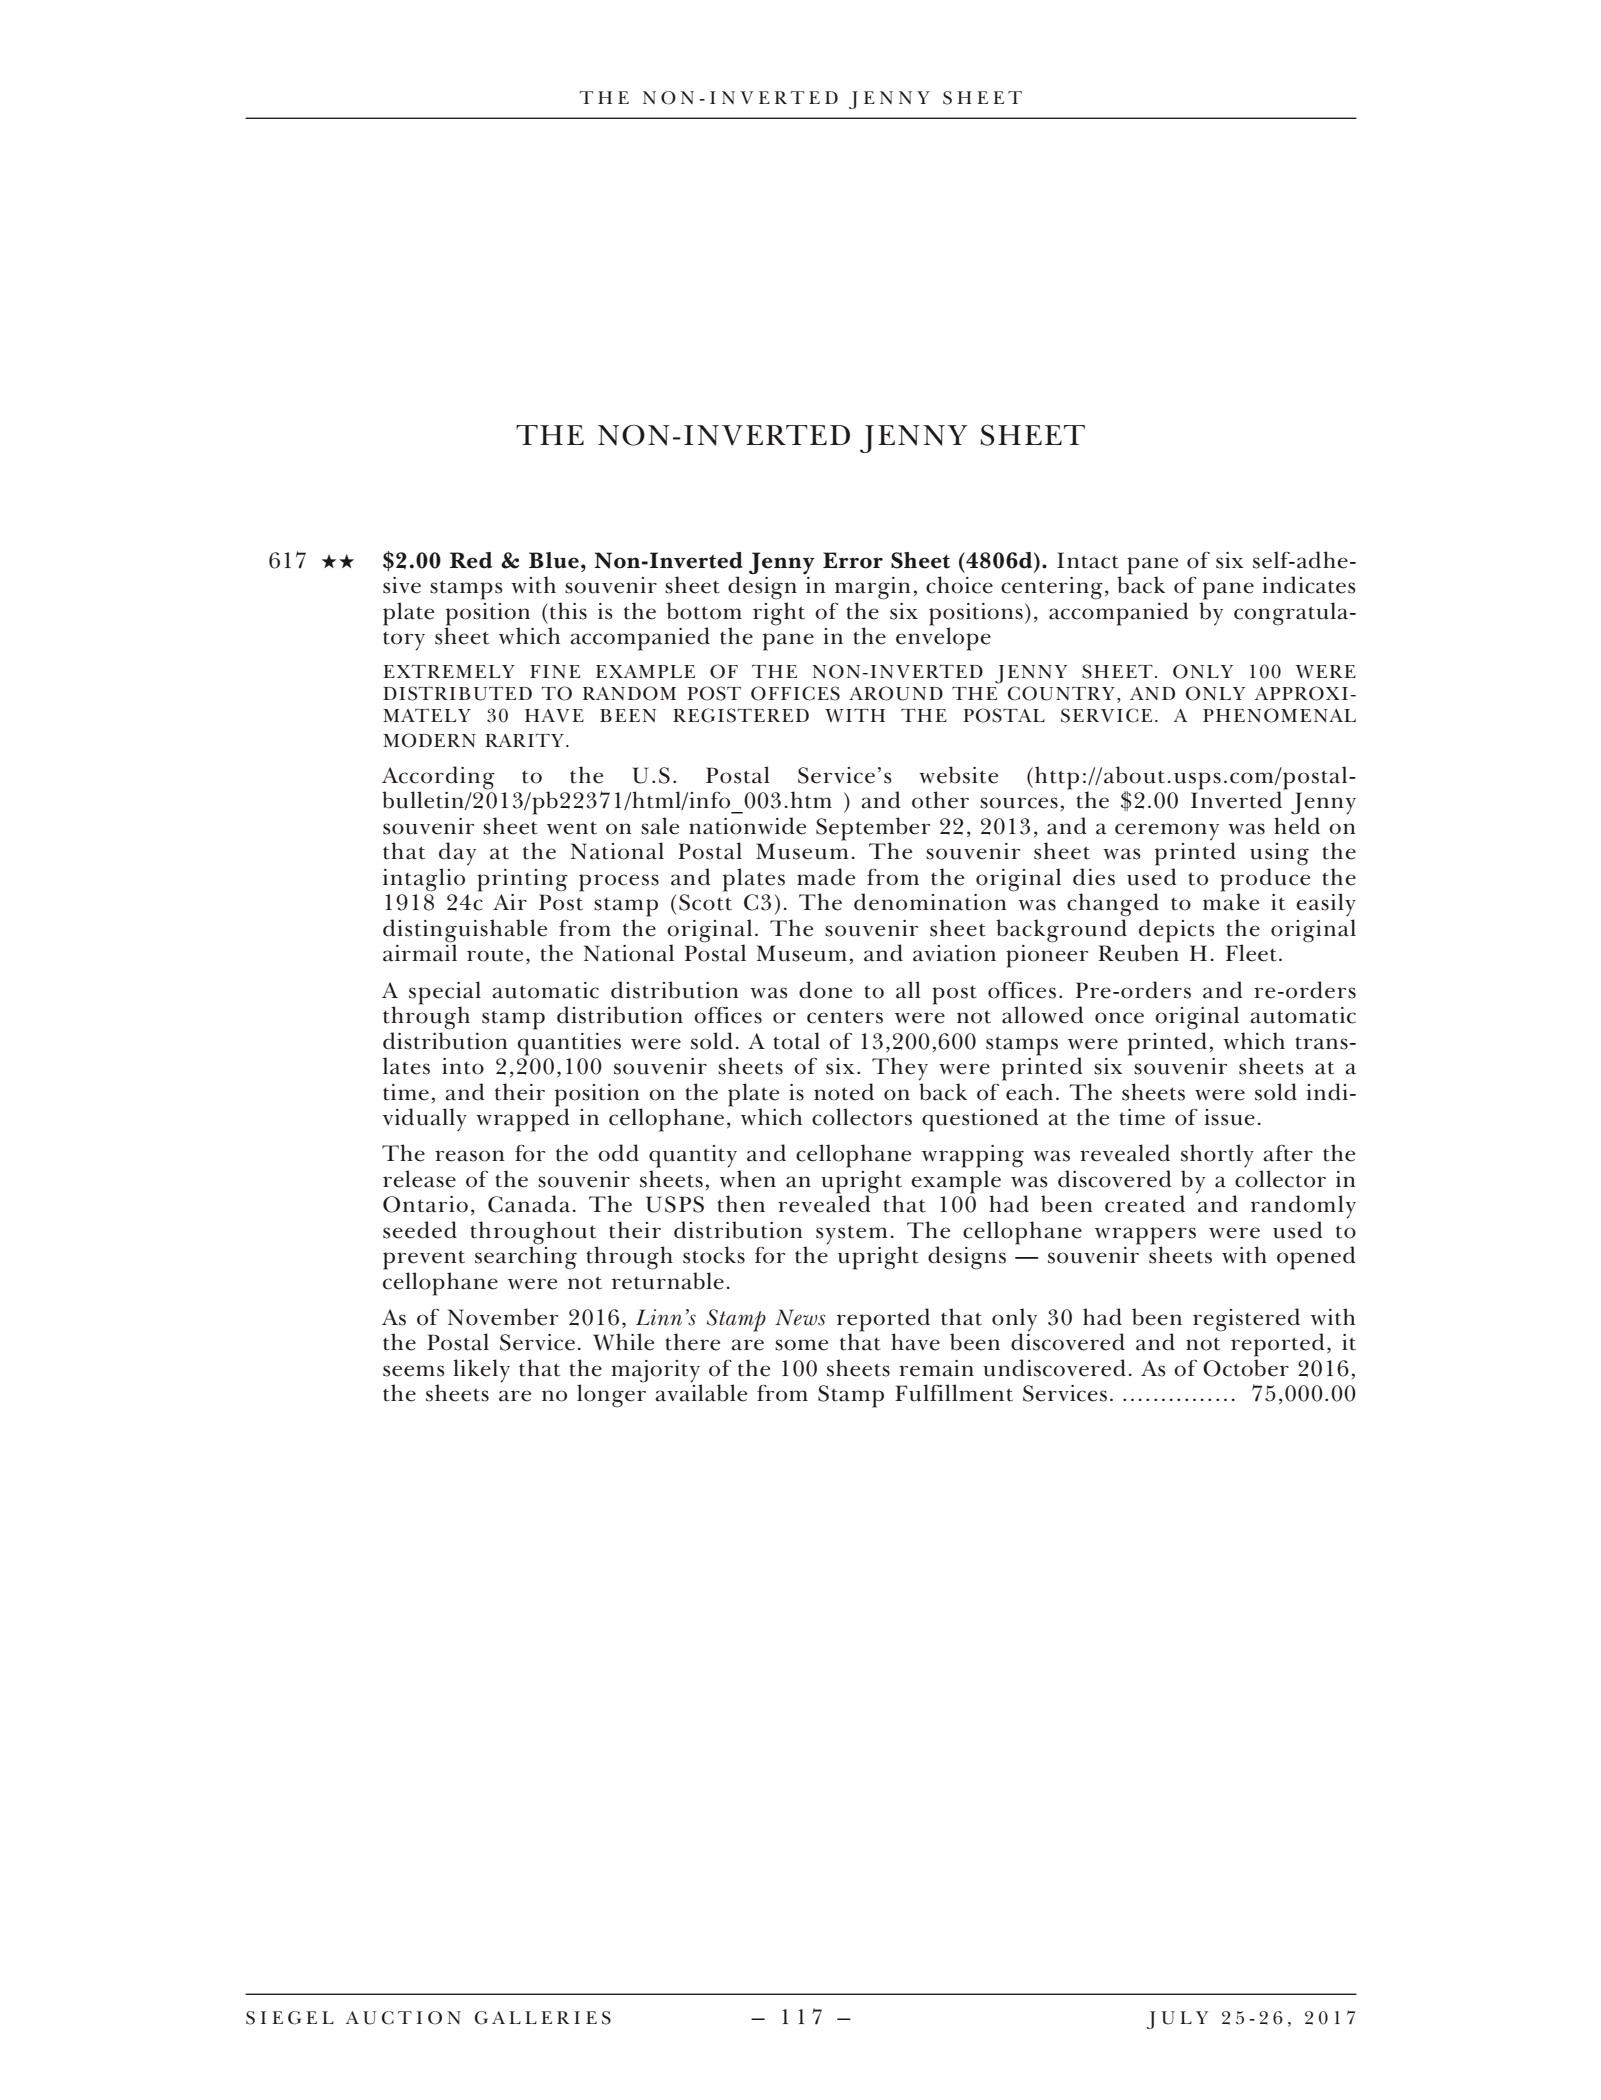 Description page for the